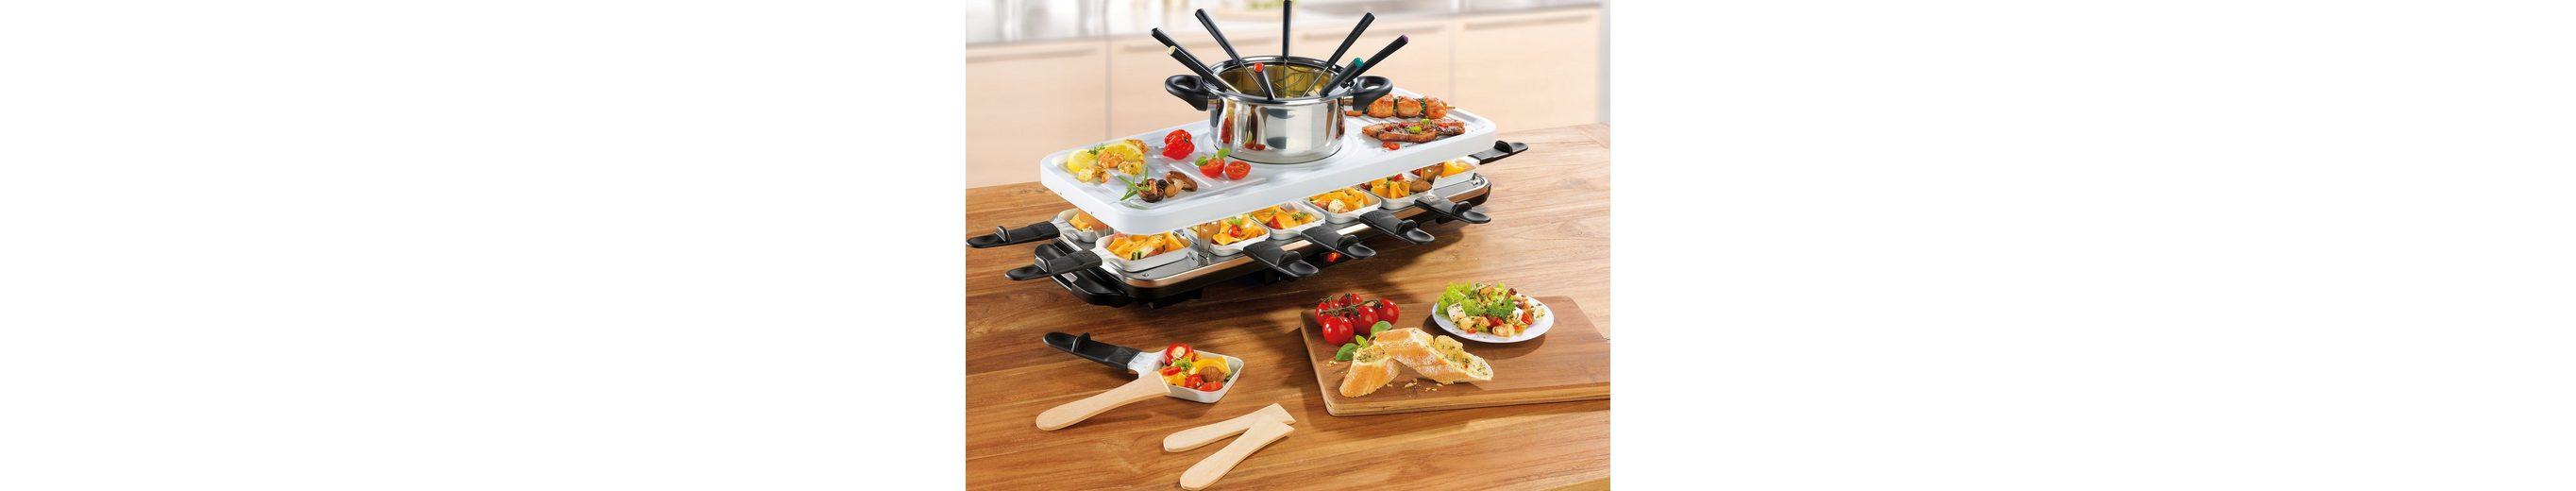 gourmetmaxx Raclette- und Fondue Set, Keramik, 1600 Watt